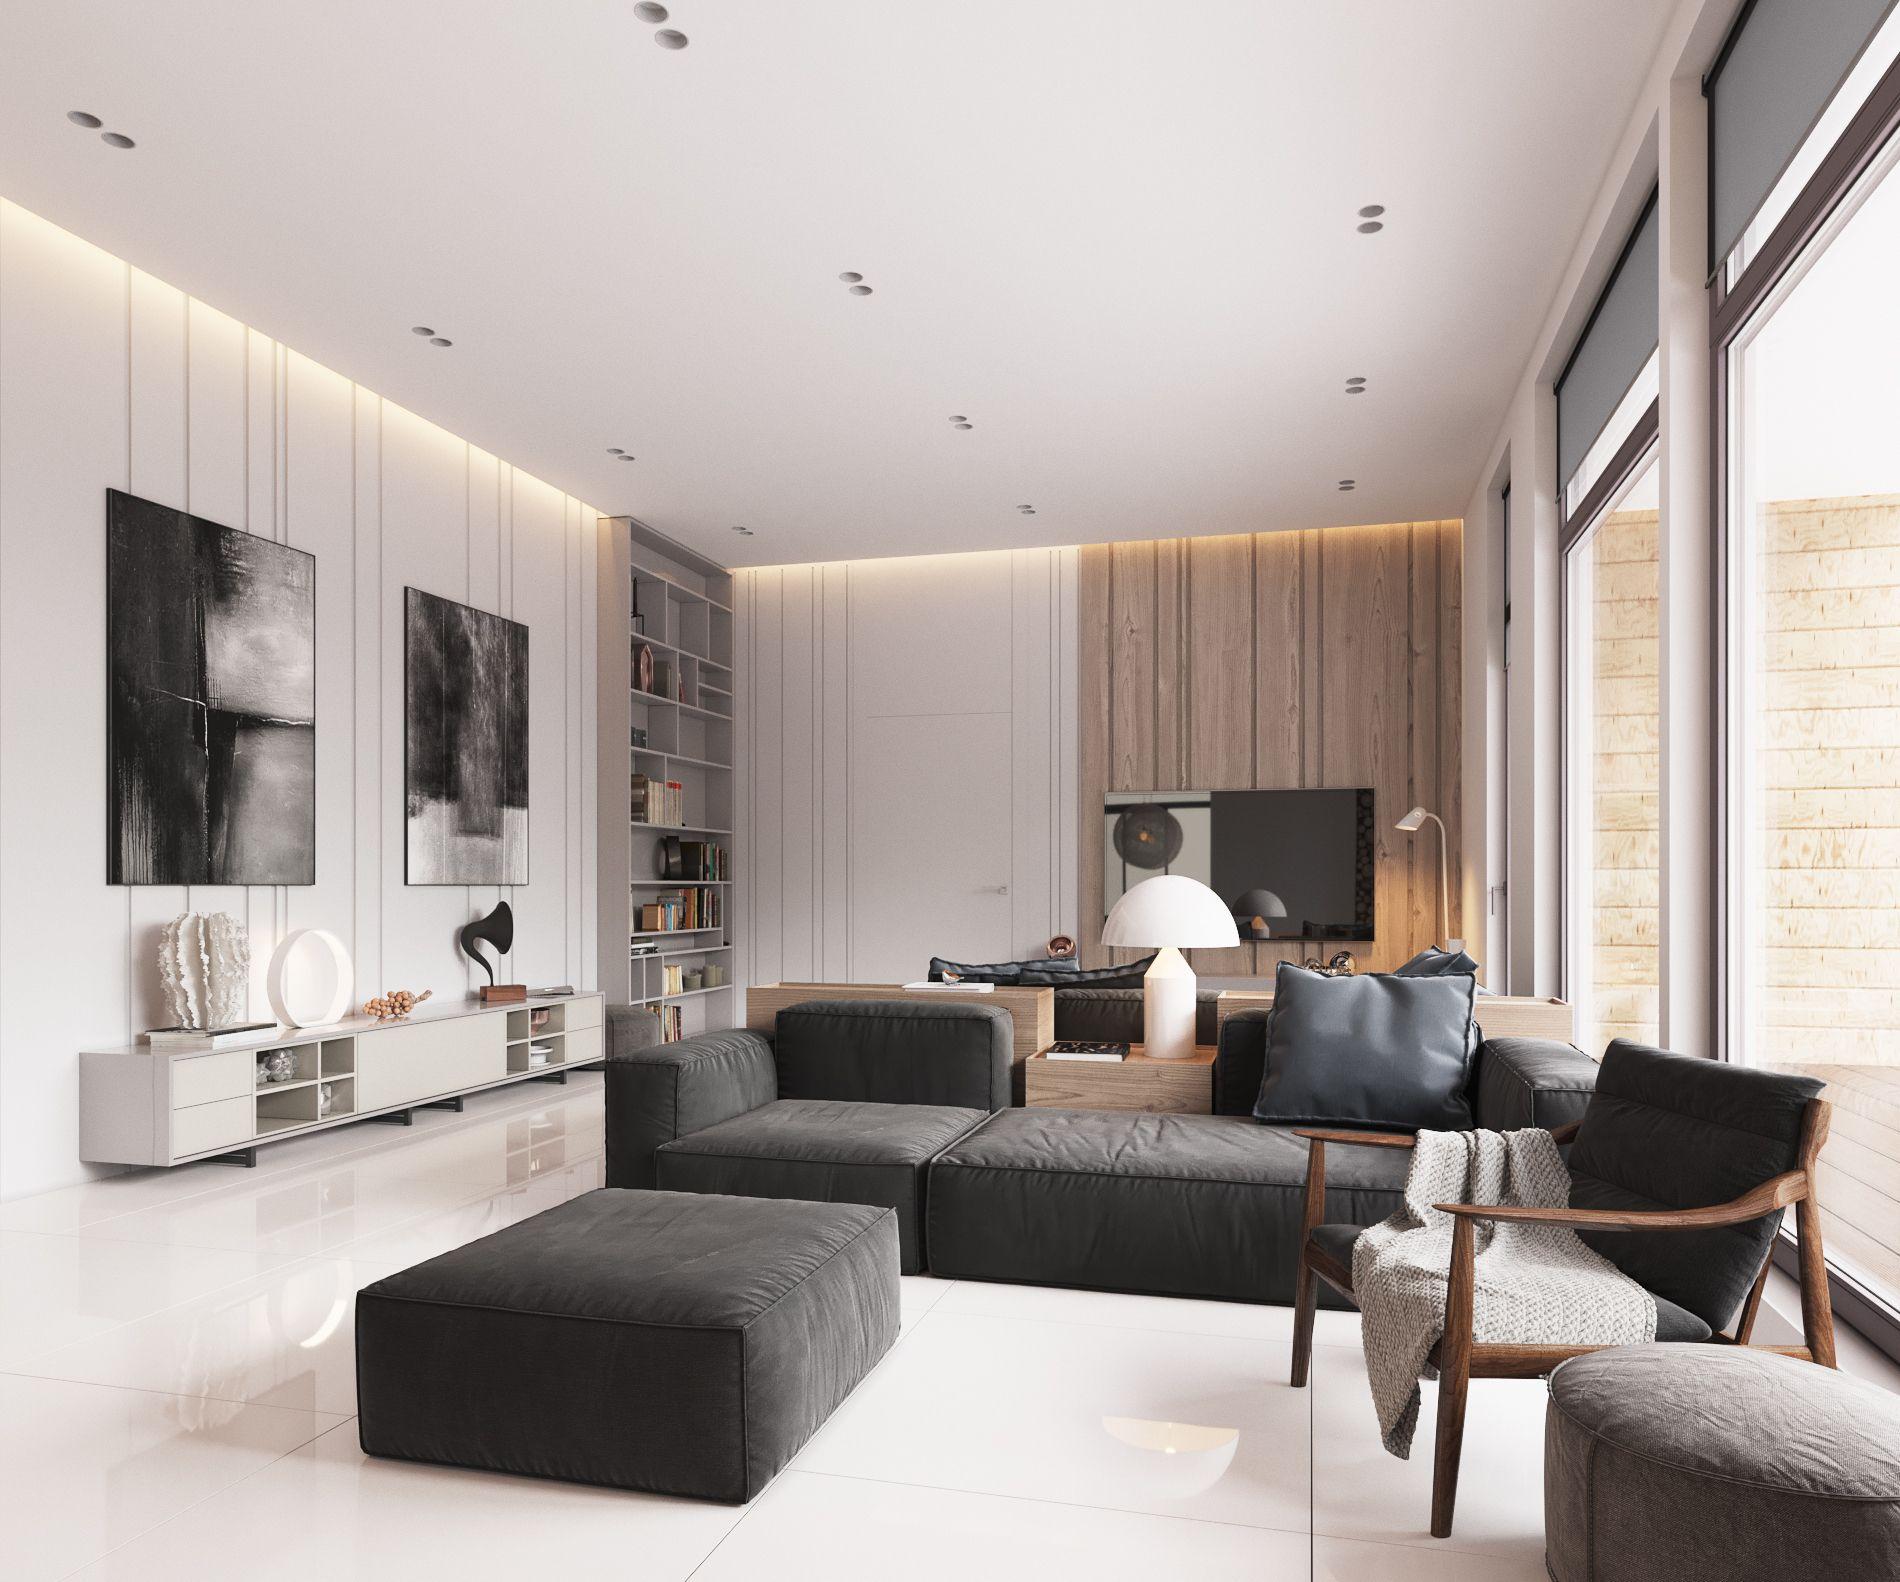 49cf68be52512b365696a5f9c6095243 - 32+ Living Room Minimalist House Interior Design Pics